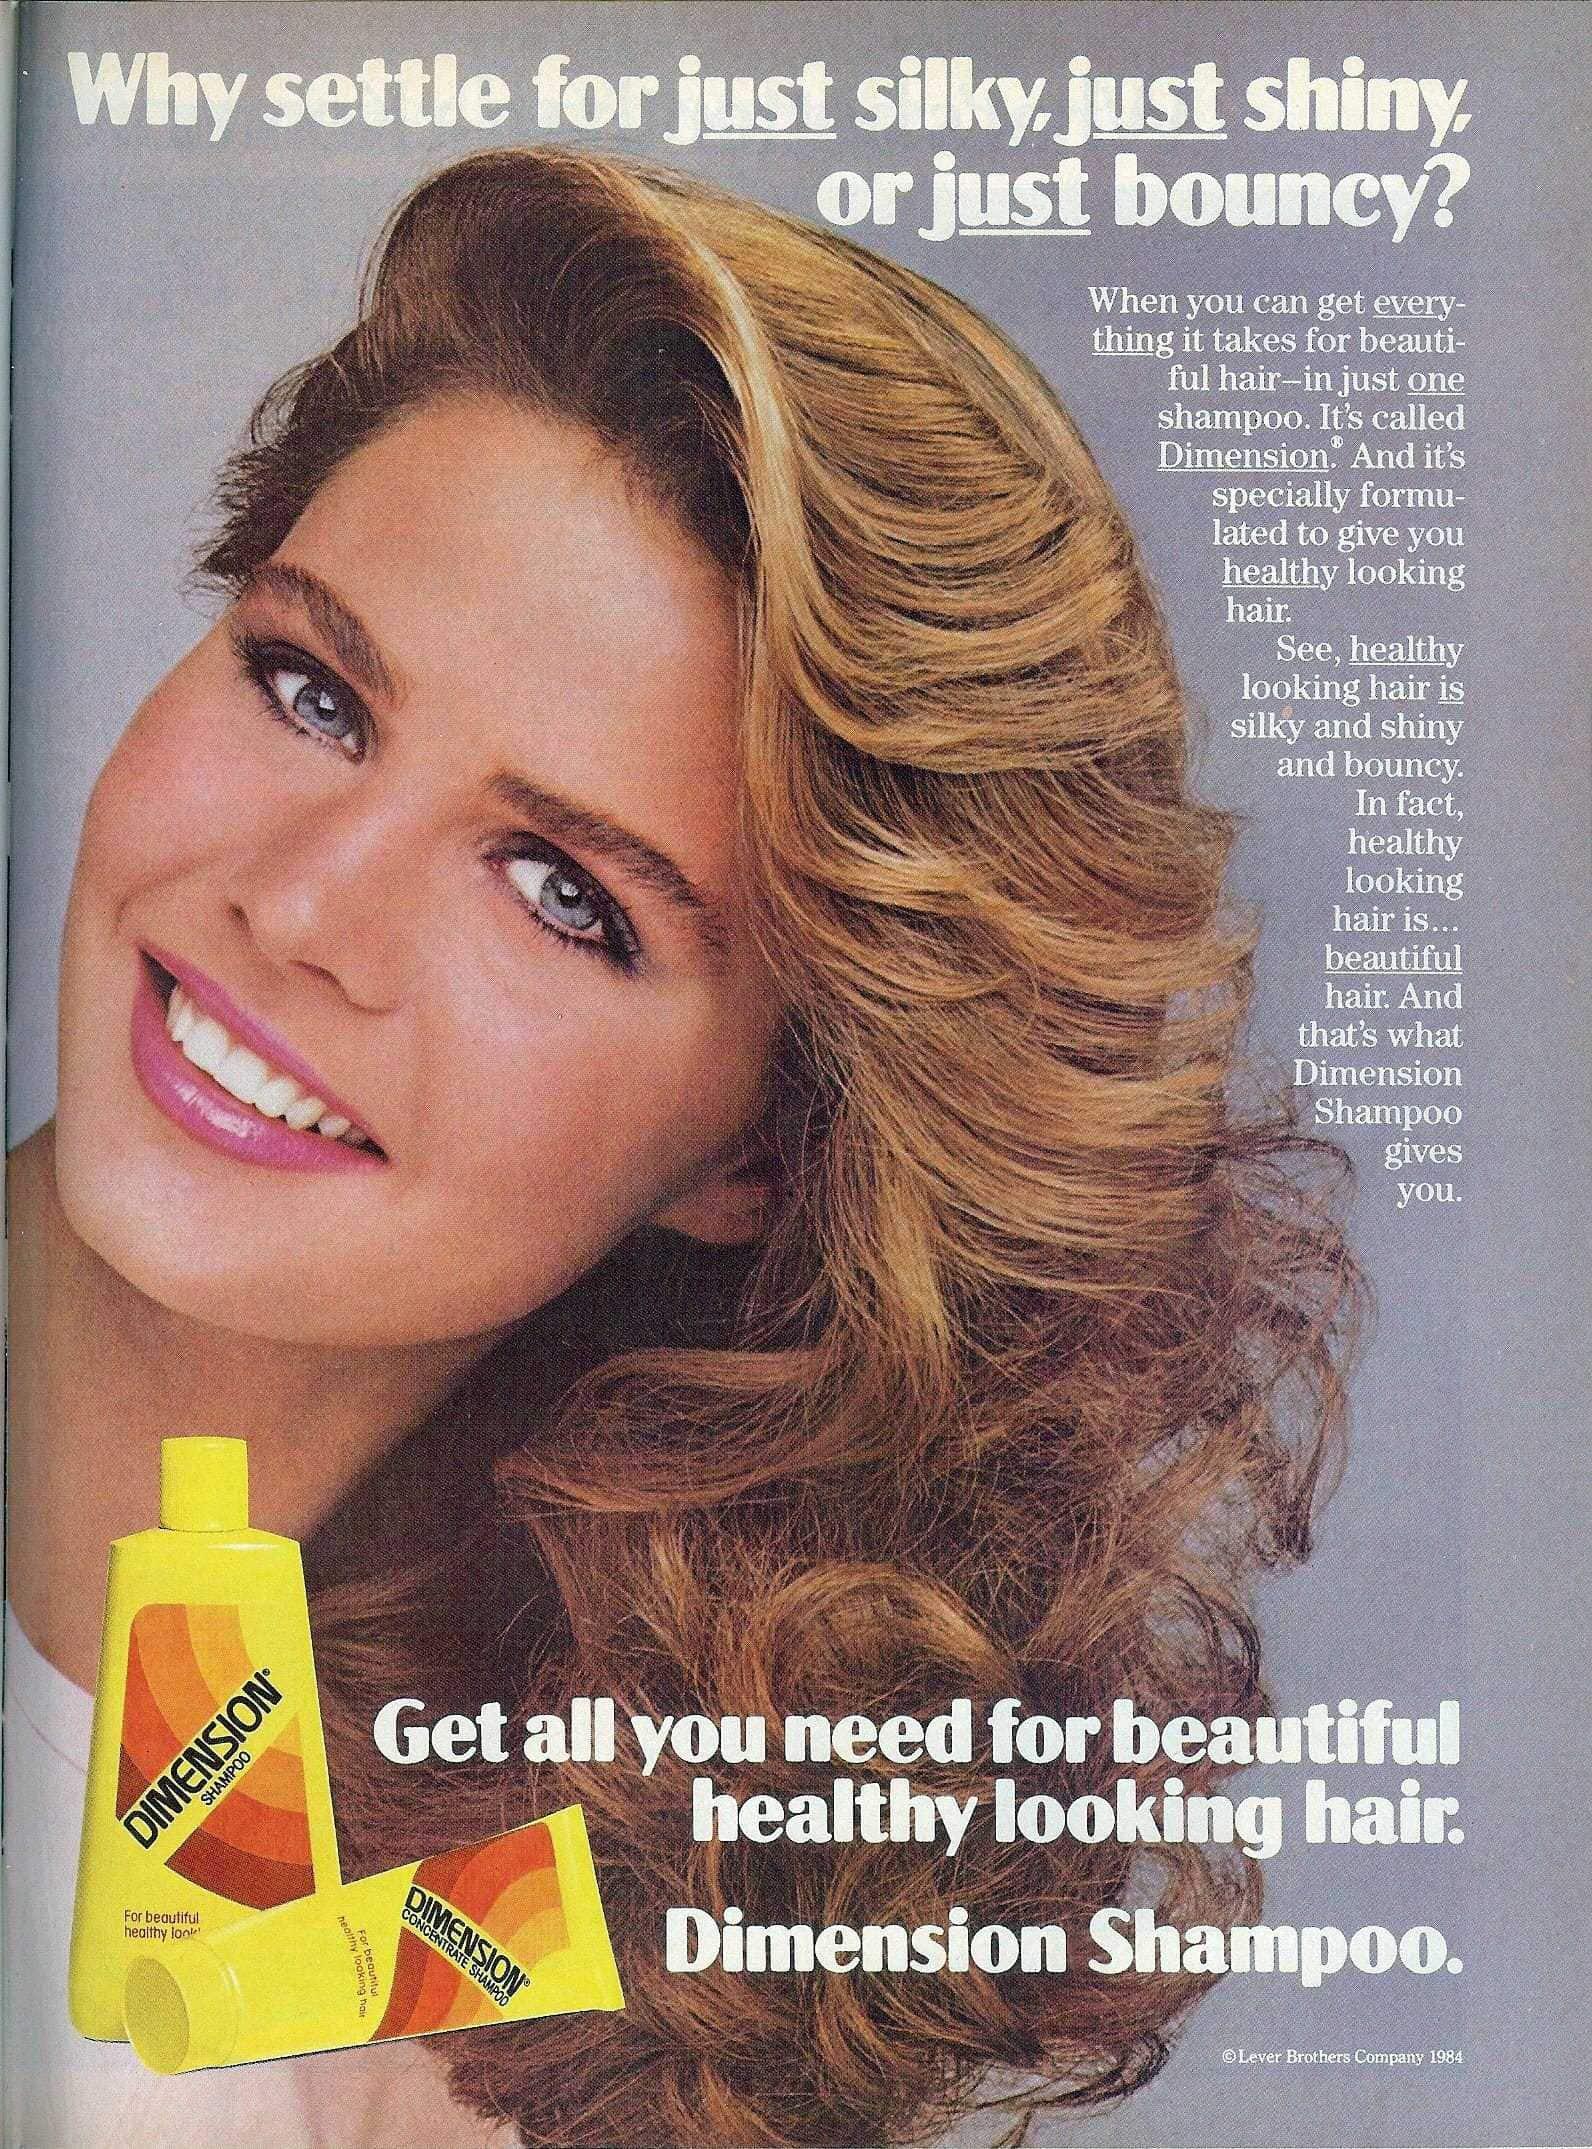 Vintage Dimension Shampoo beautiful healthy looking hair (1984)